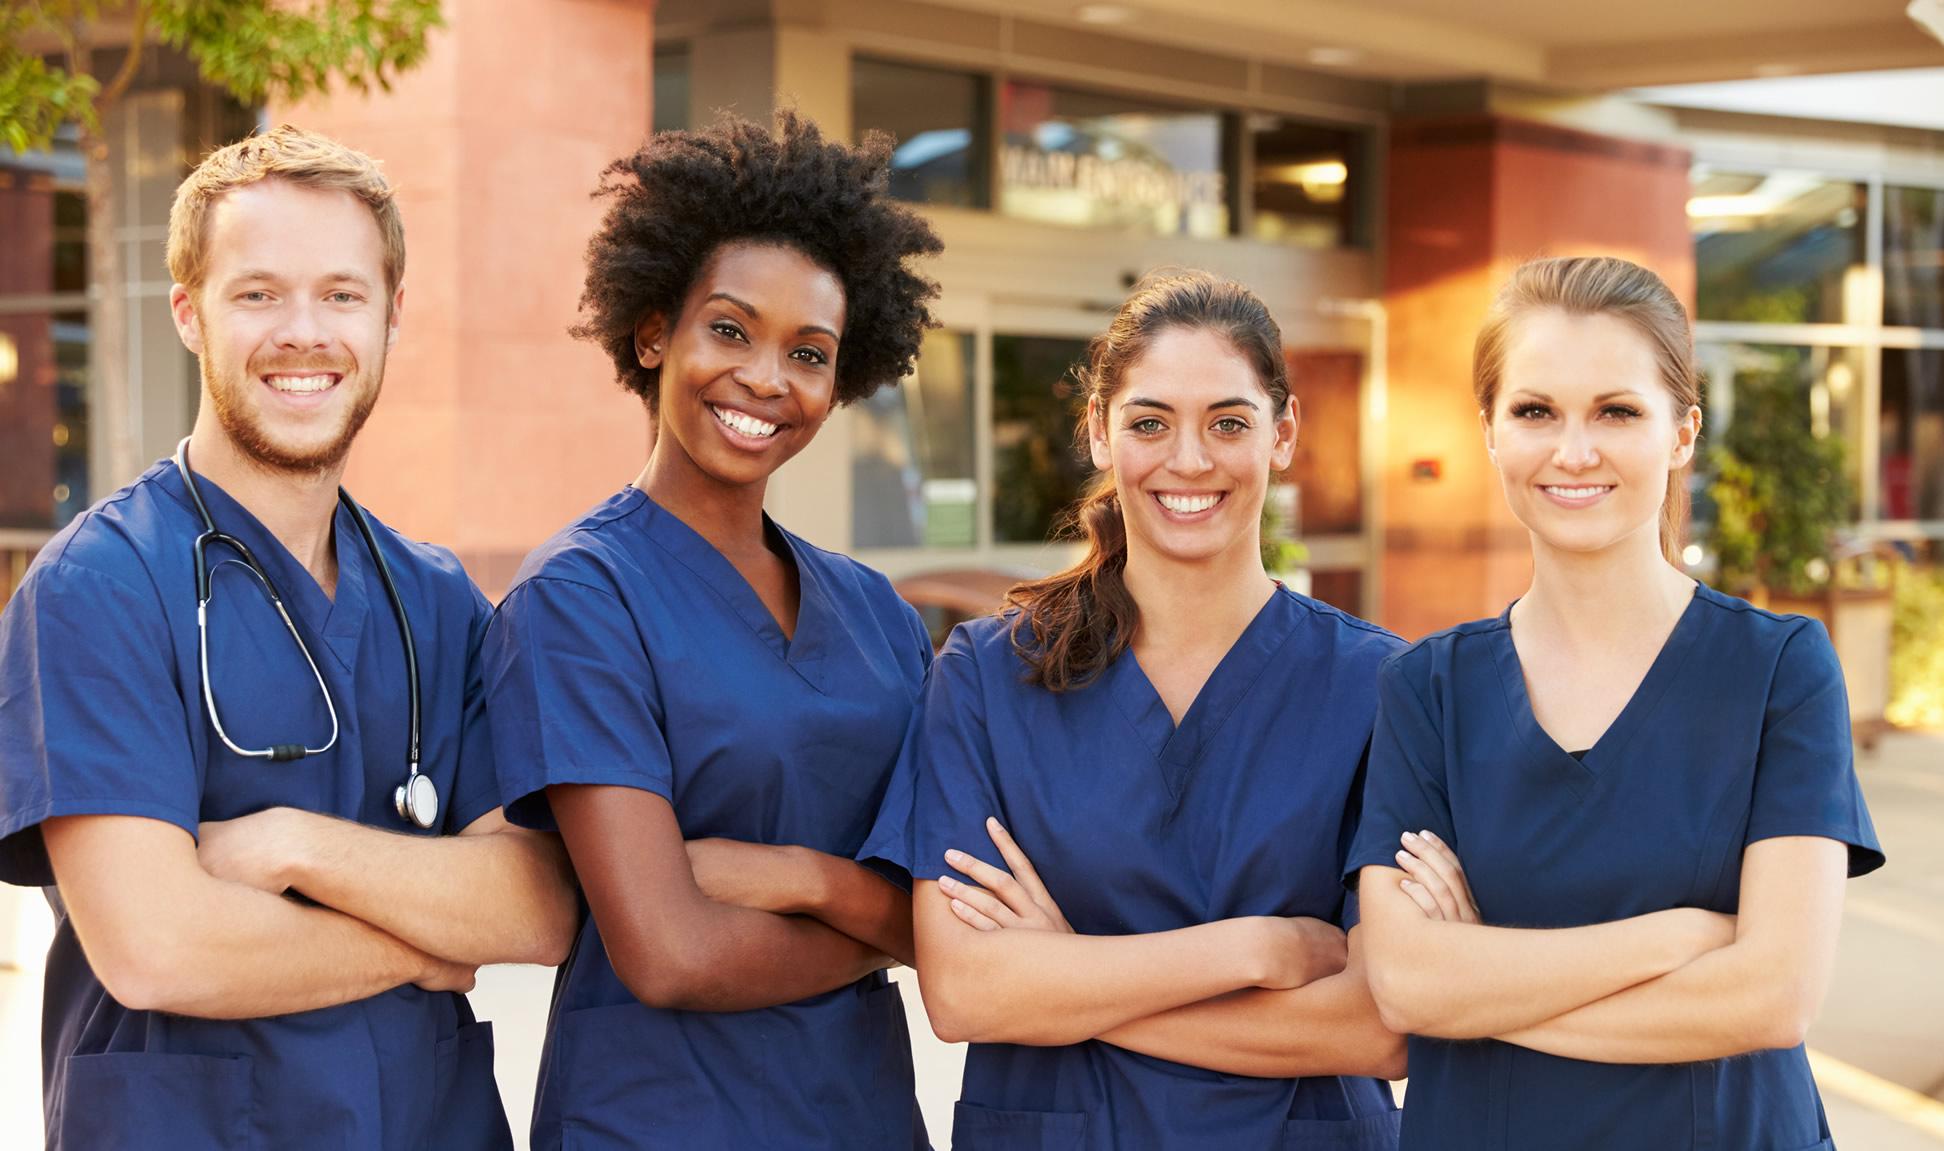 5 Important Skills CNAs Need to Possess